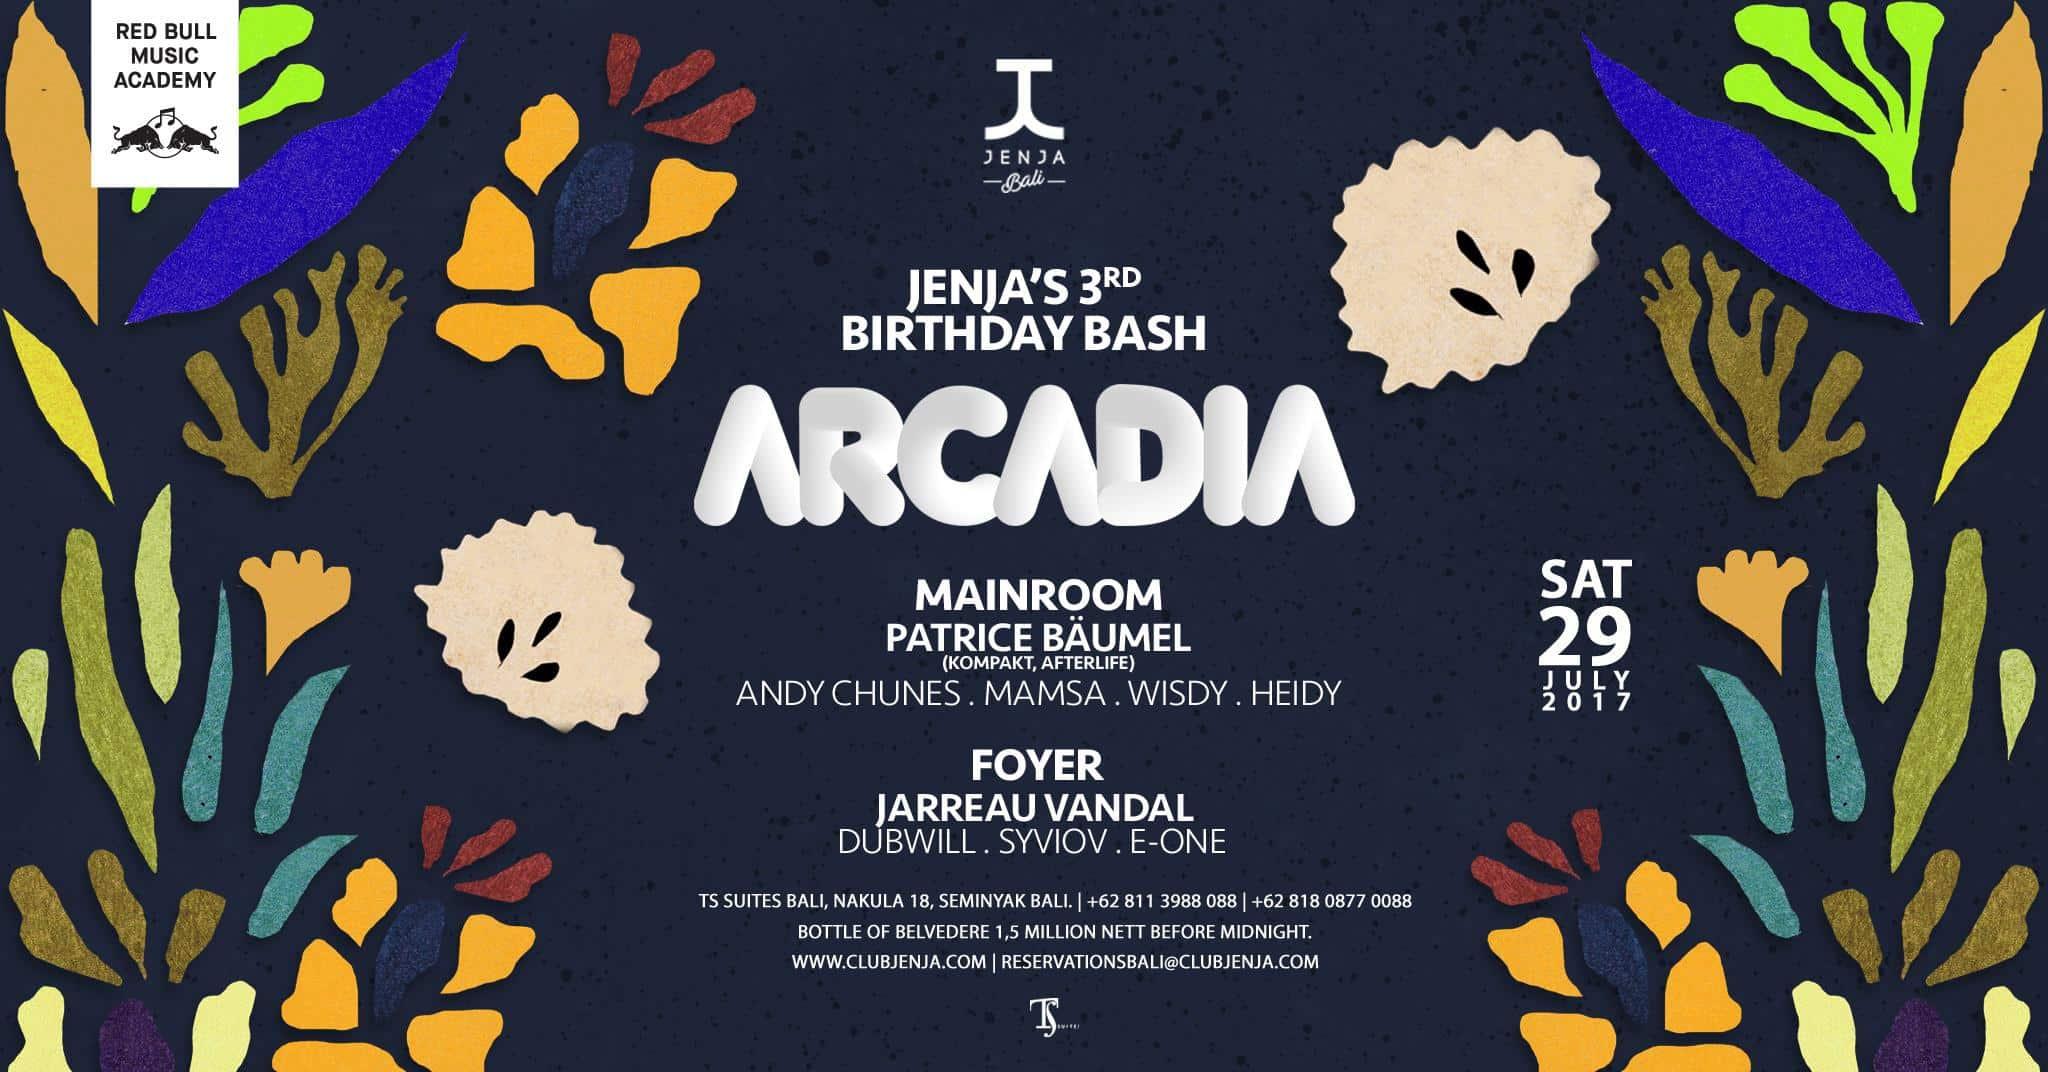 JENJA'S 3RD BIRTHDAY BASH